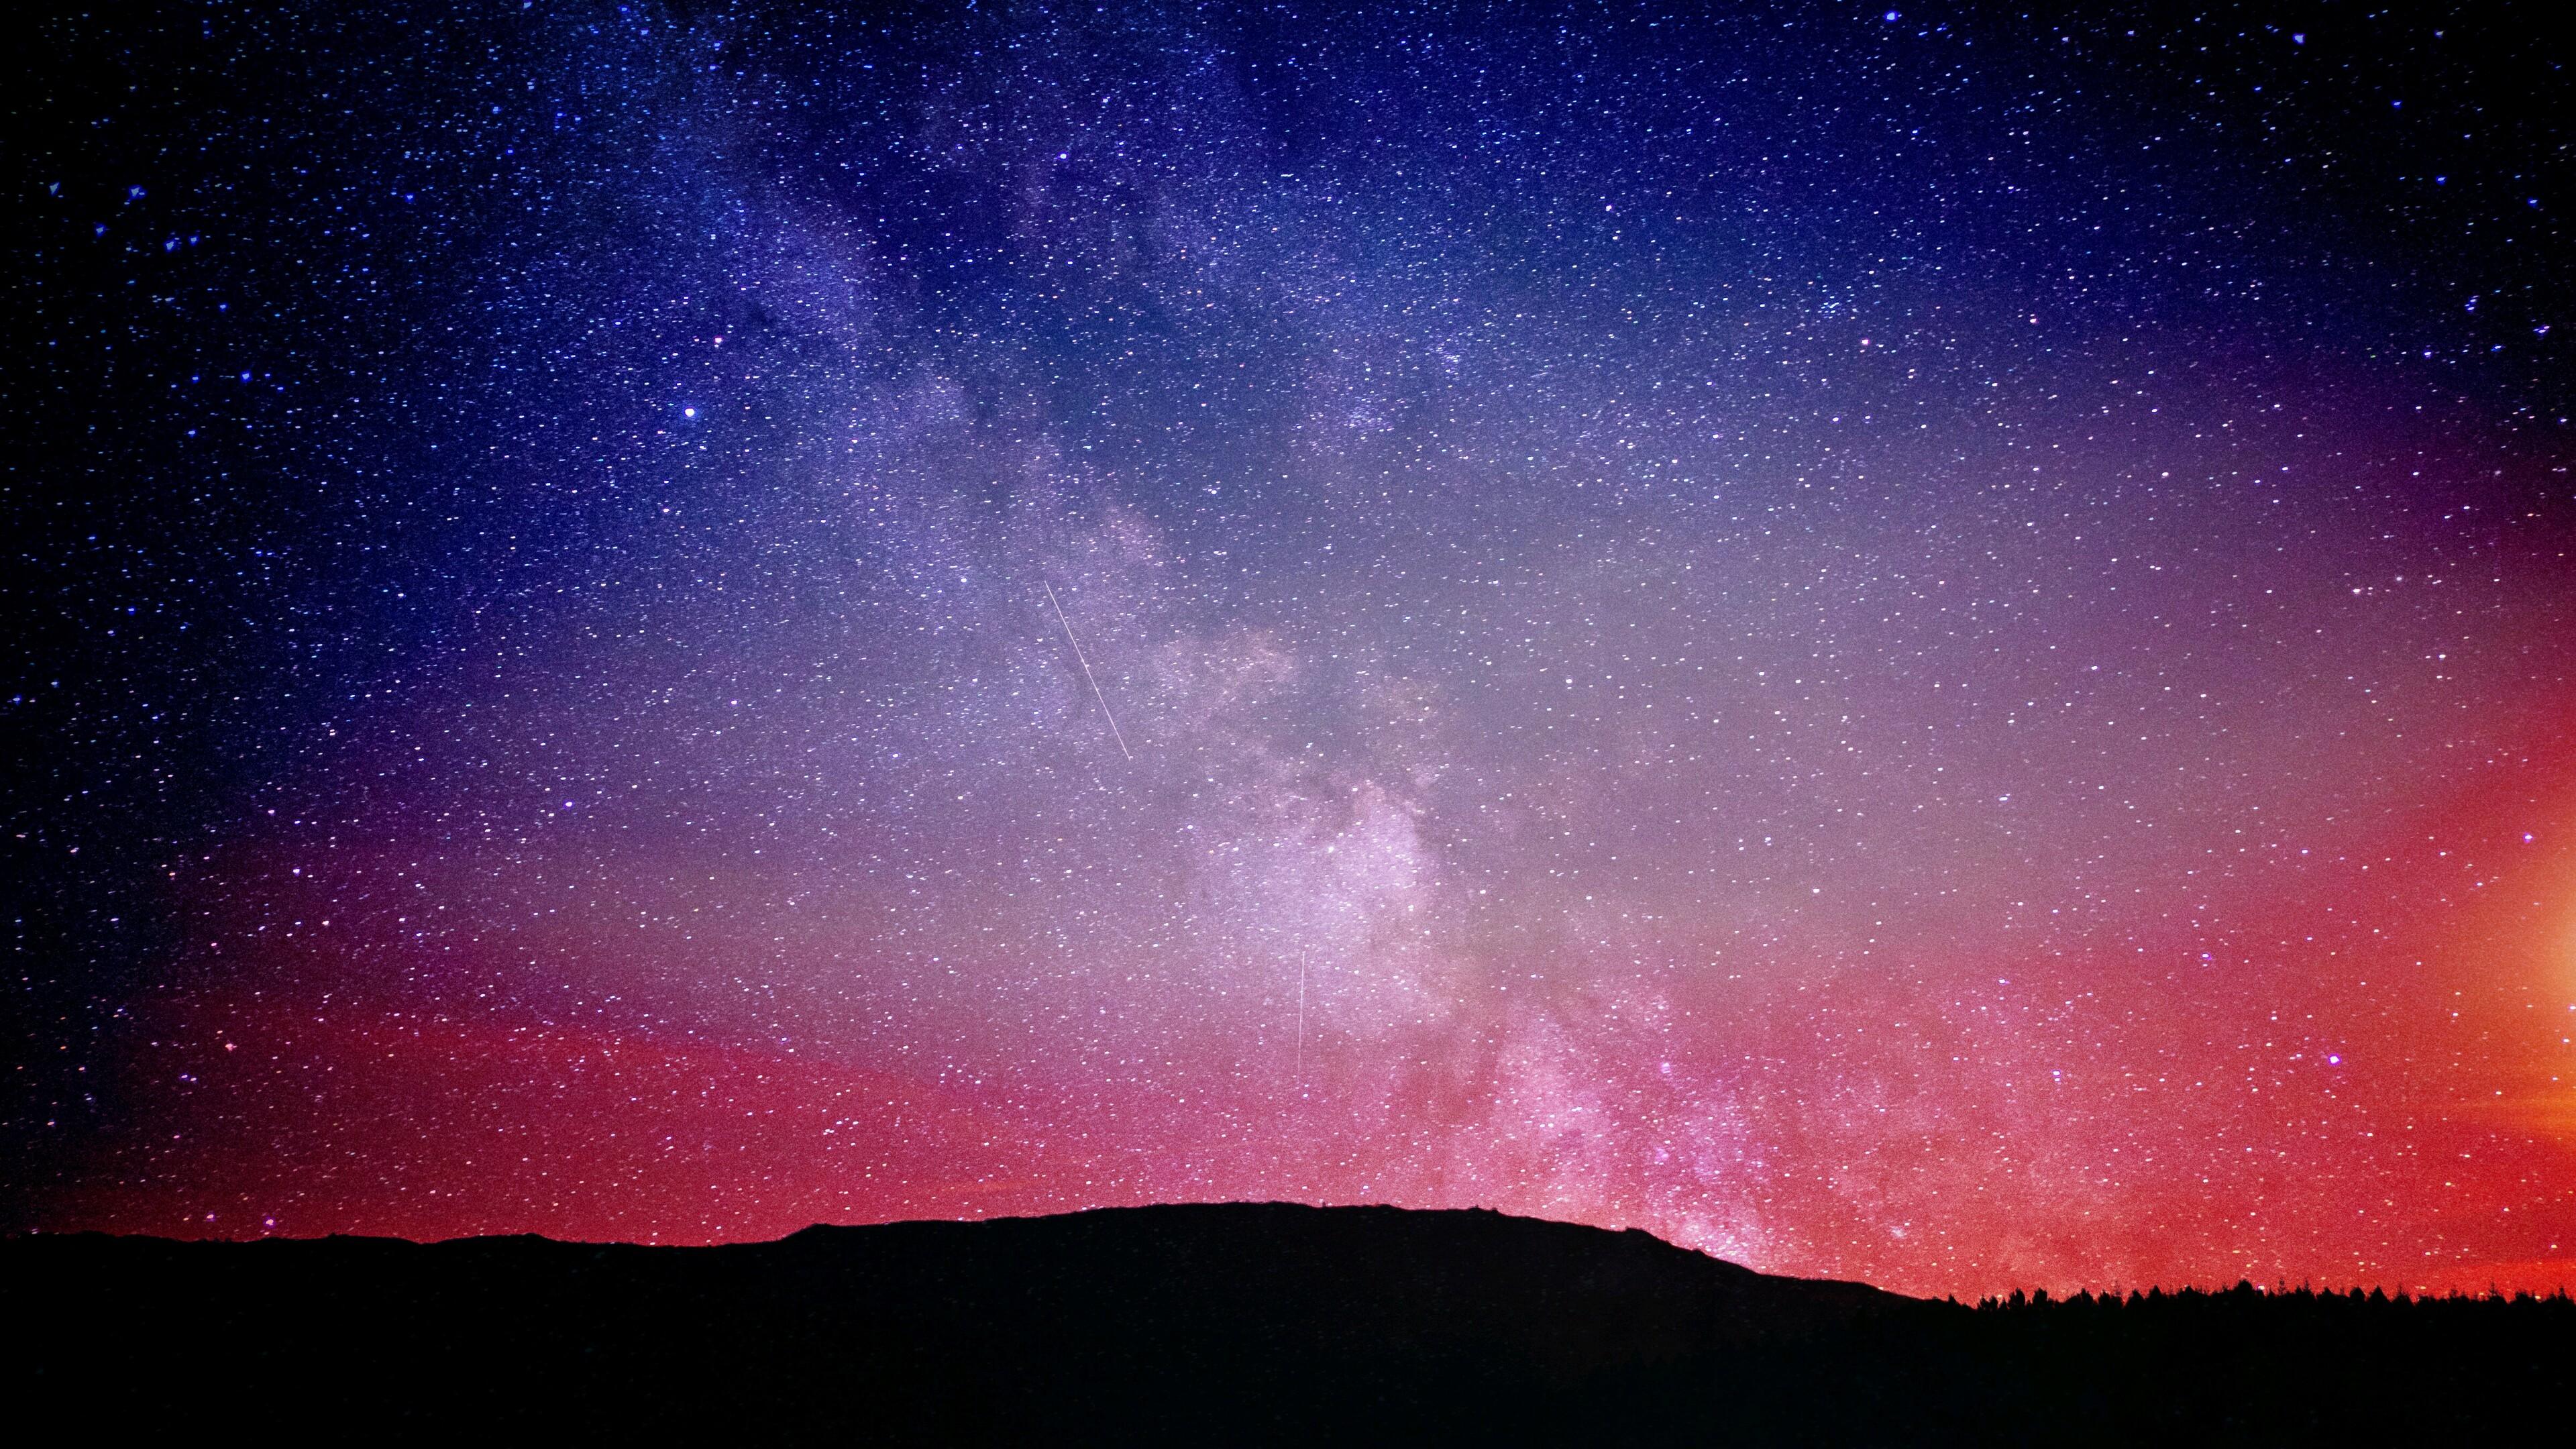 3840x2160 Night Sky Constellations 4k 4k Hd 4k Wallpapers